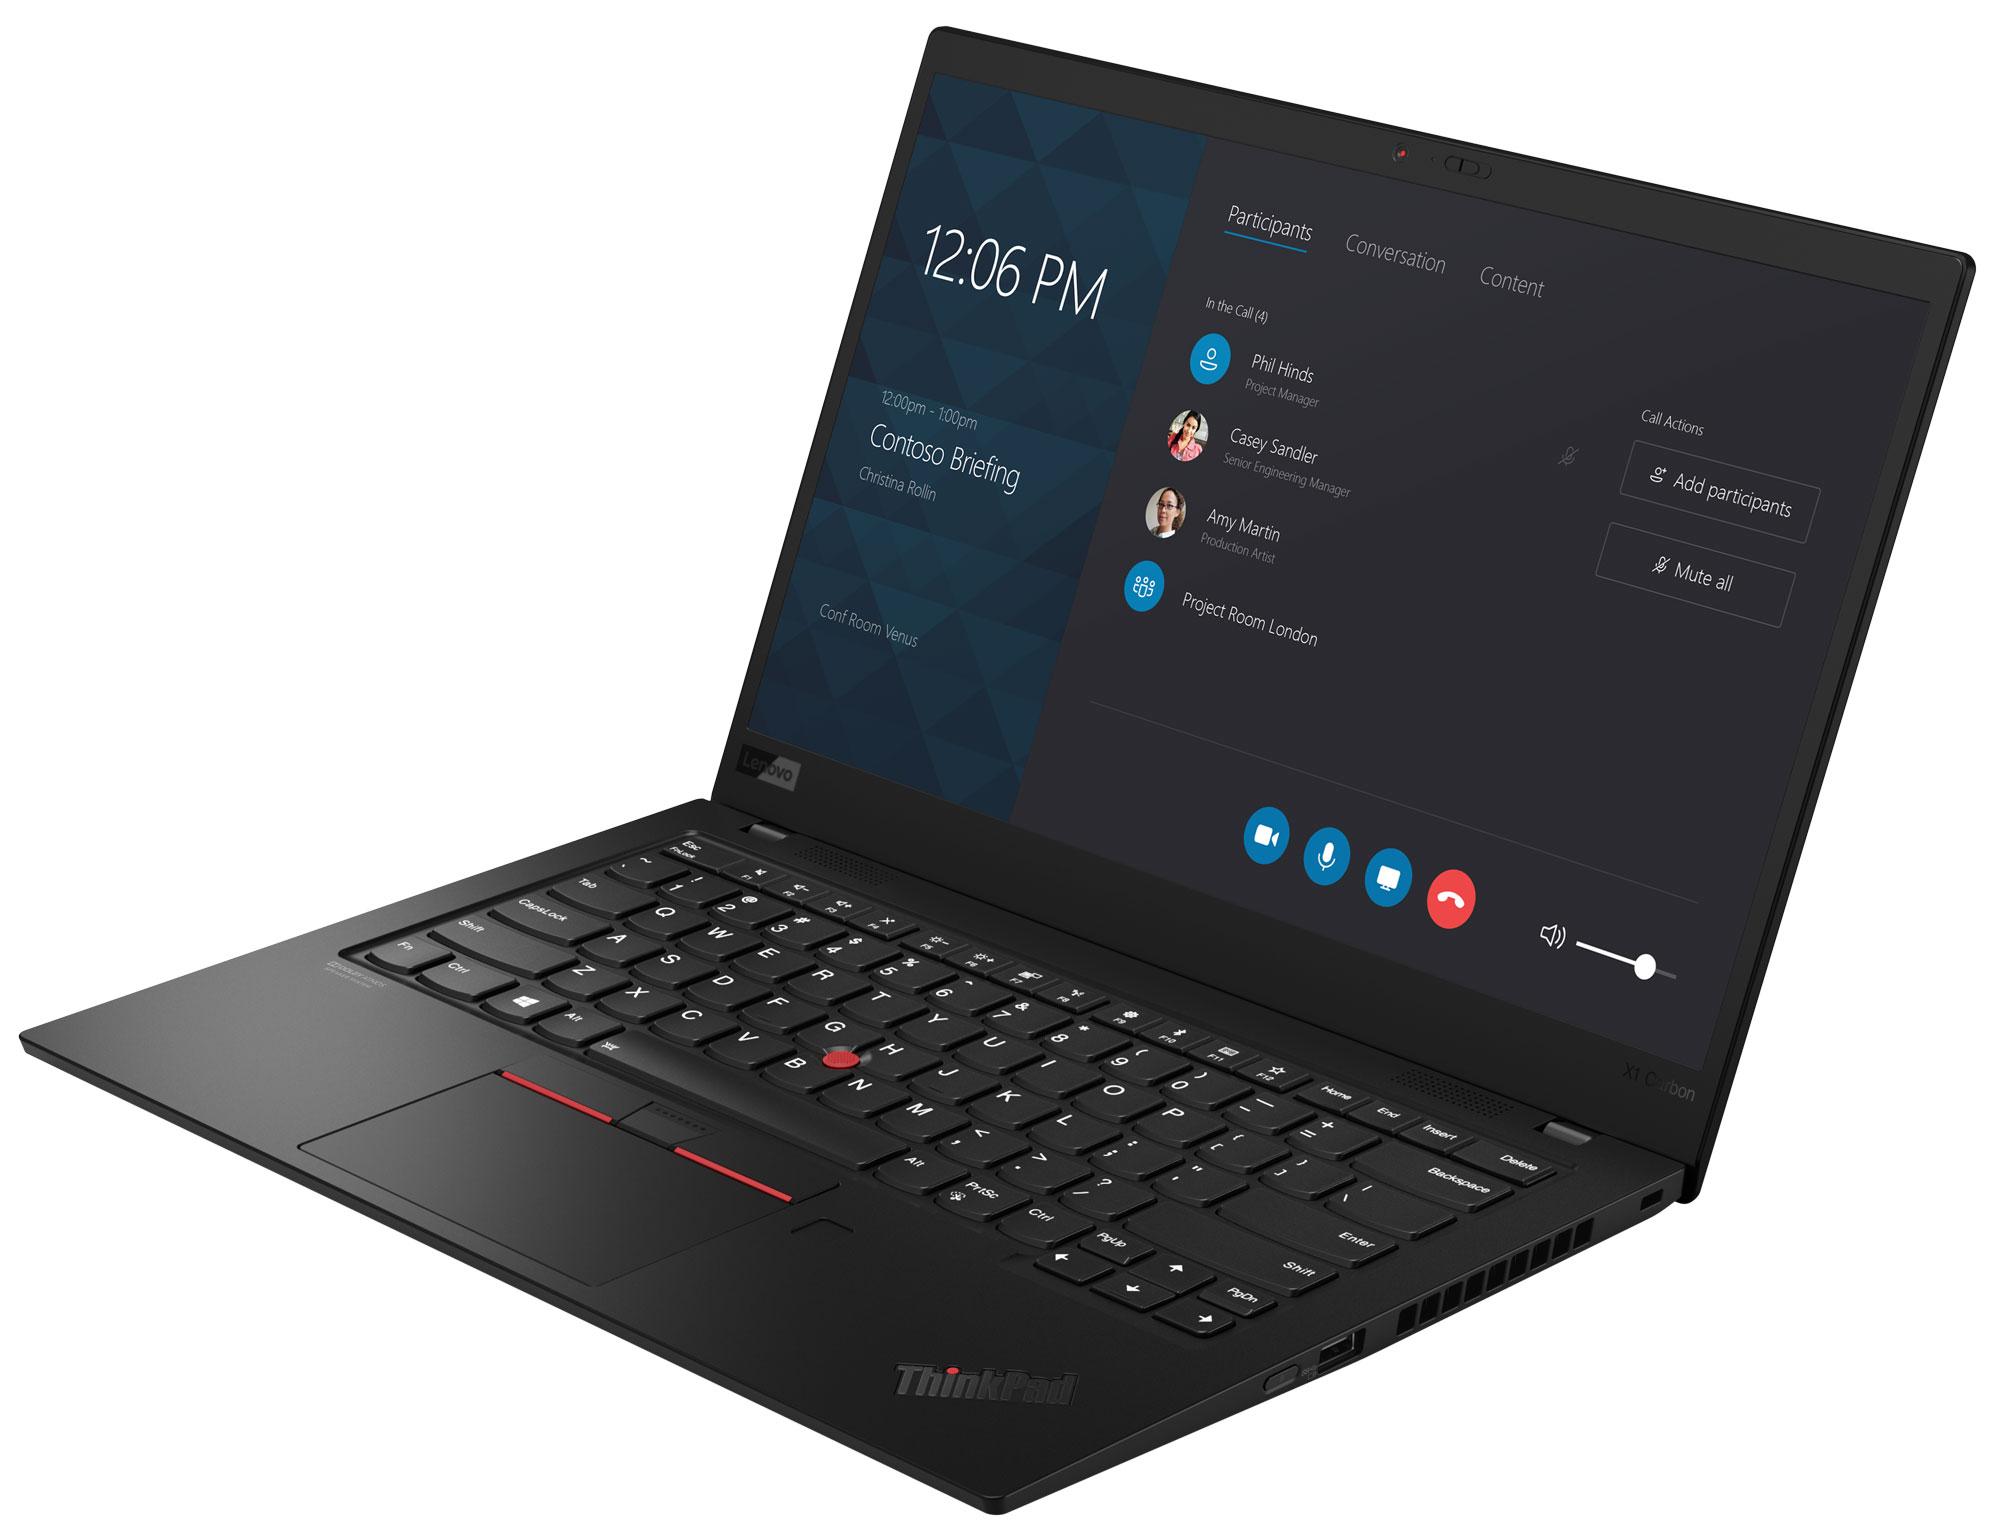 Фото  Ультрабук ThinkPad X1 Carbon 7th Gen (20QD003JRT)